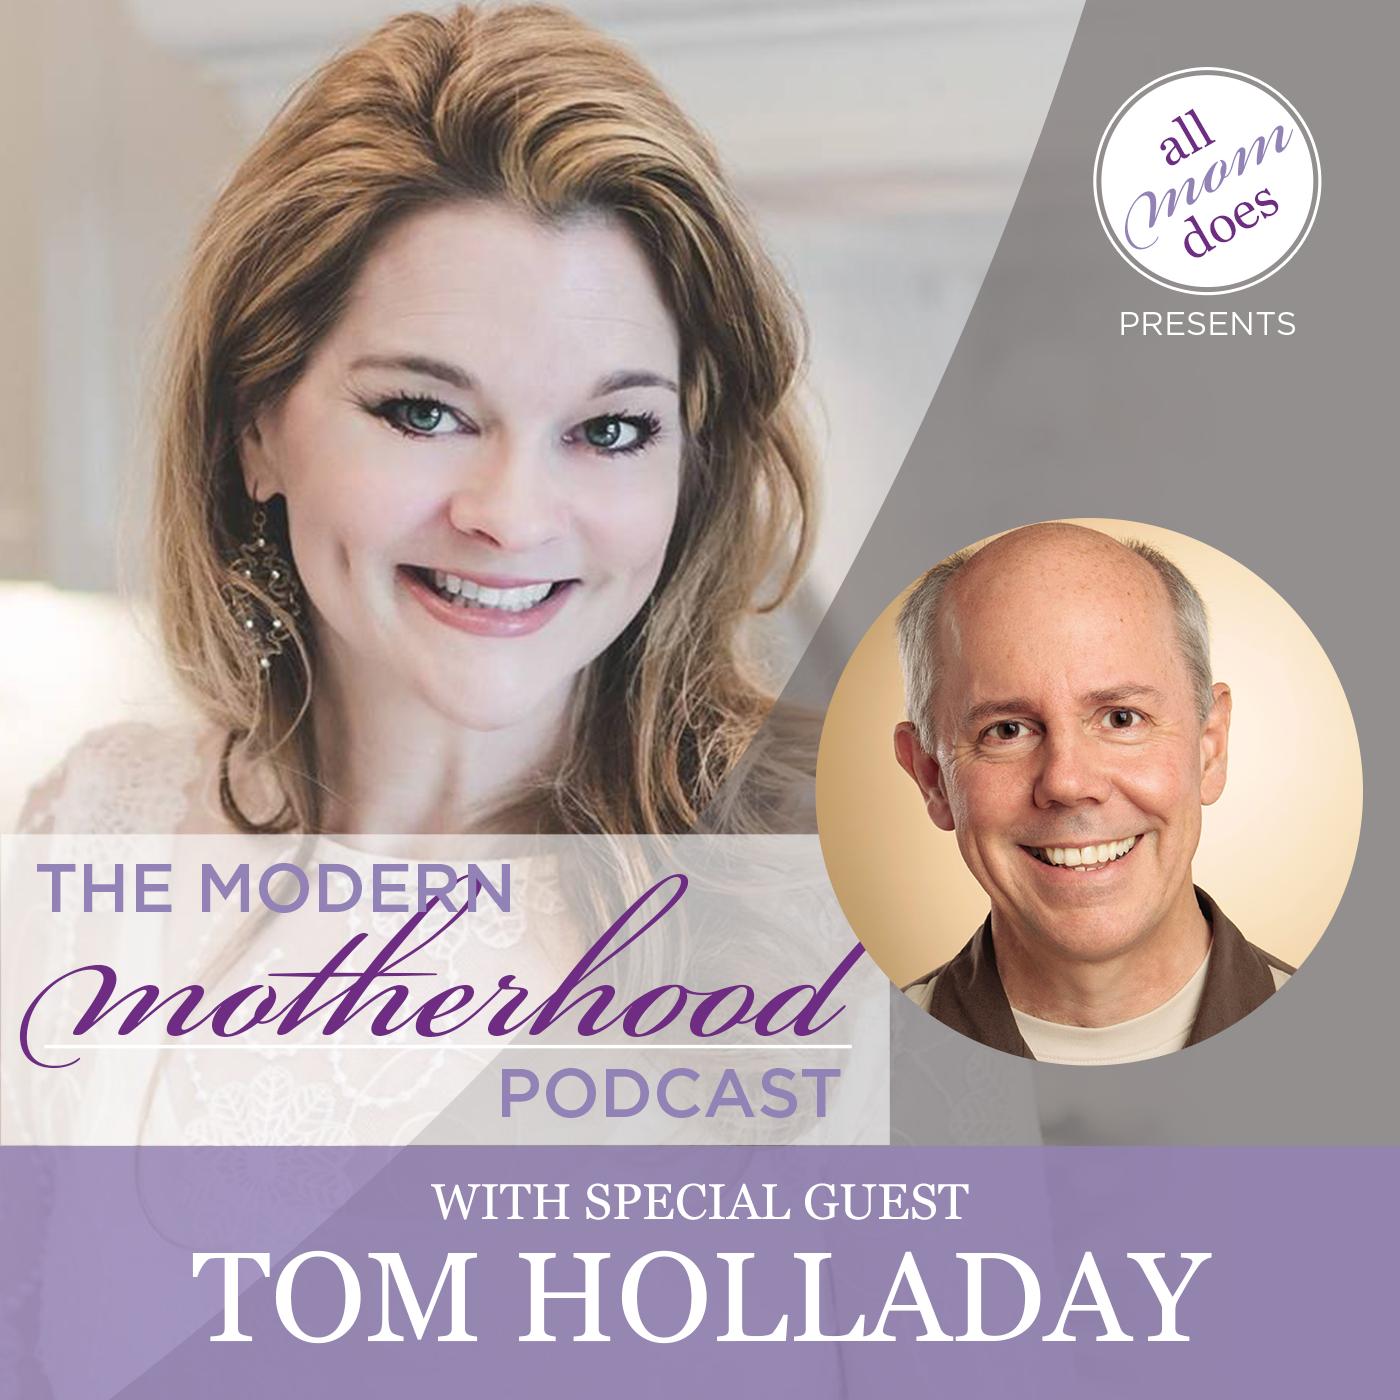 The Modern Motherhood Podcast #5: Tom Holladay